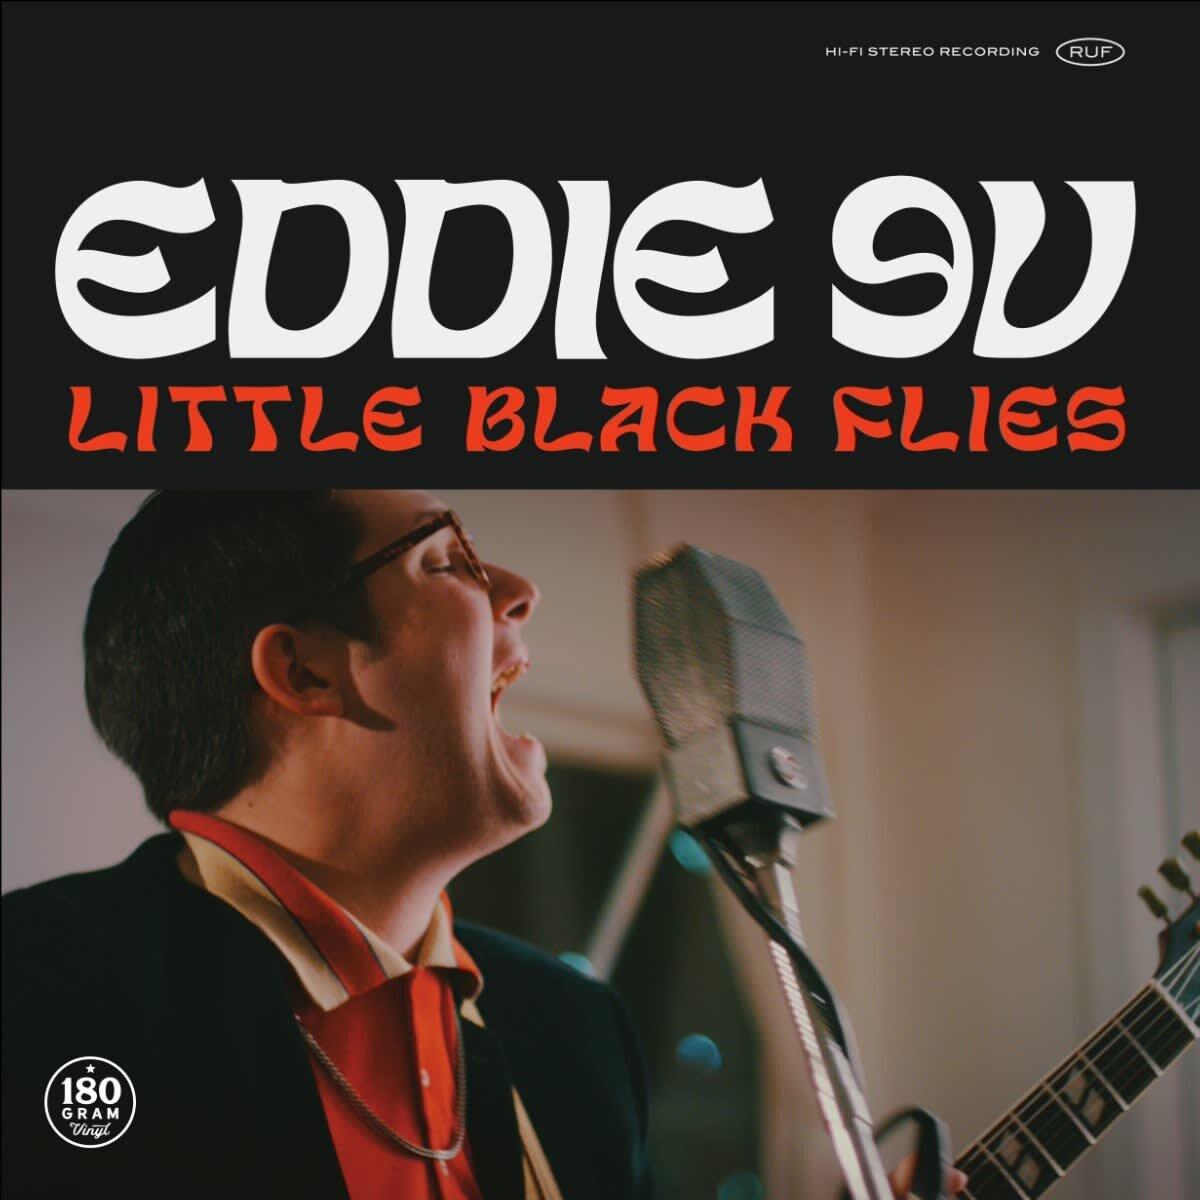 Eddie 9V - Little Black Flies, album cover